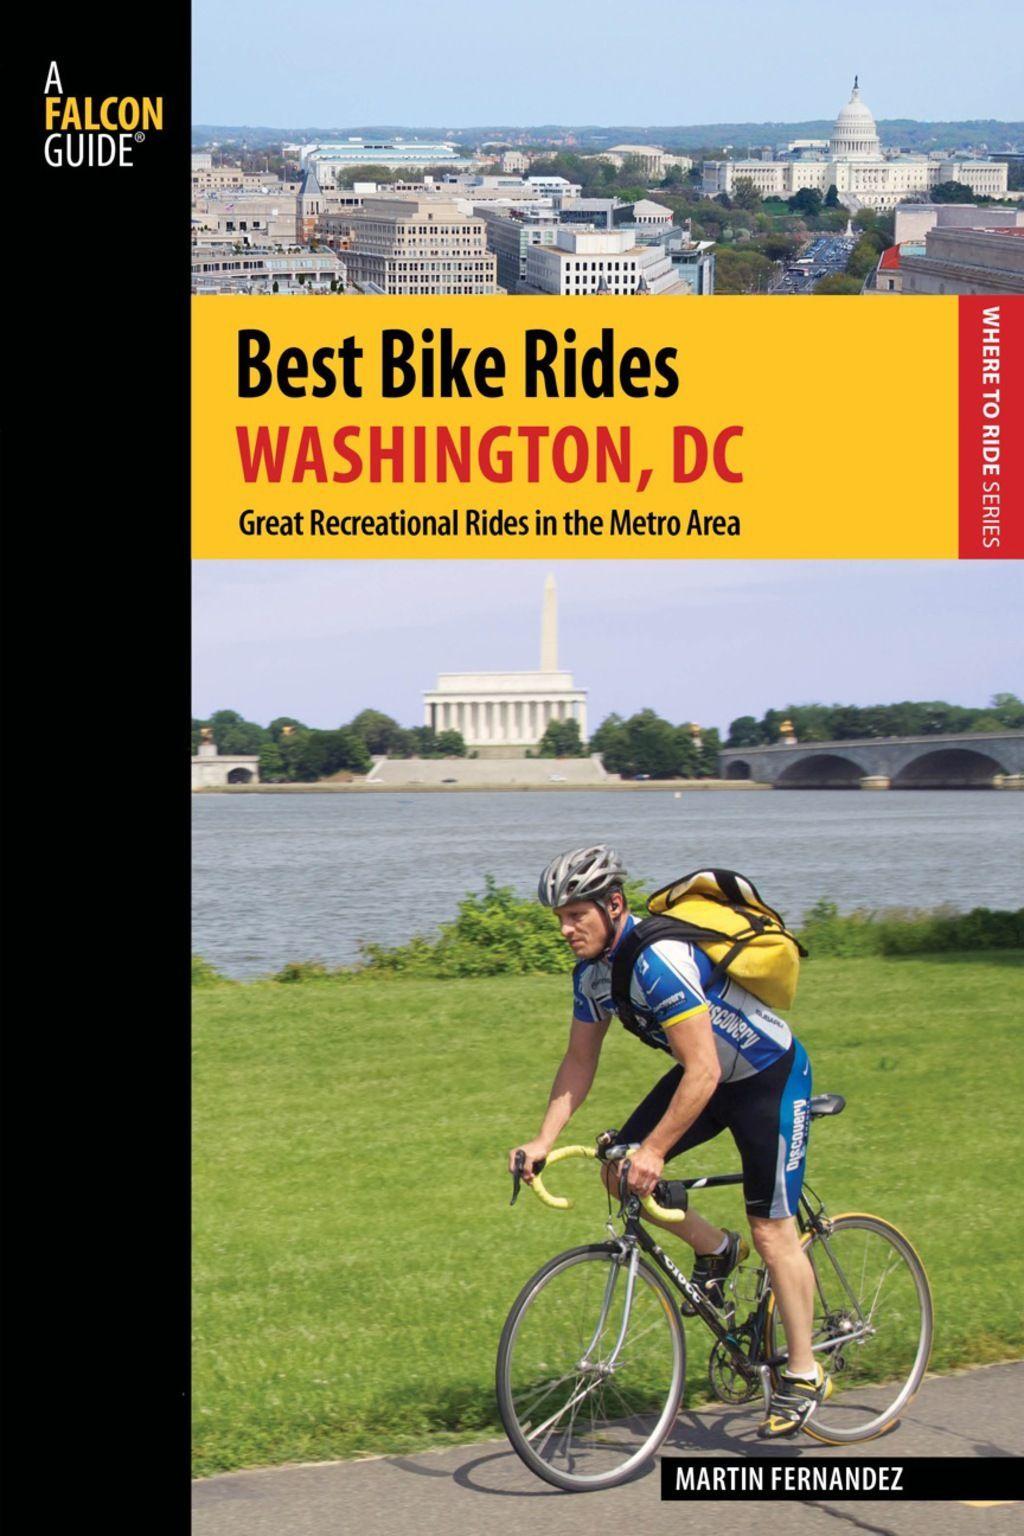 Best bike rides washington dc ebook rental cool bikes